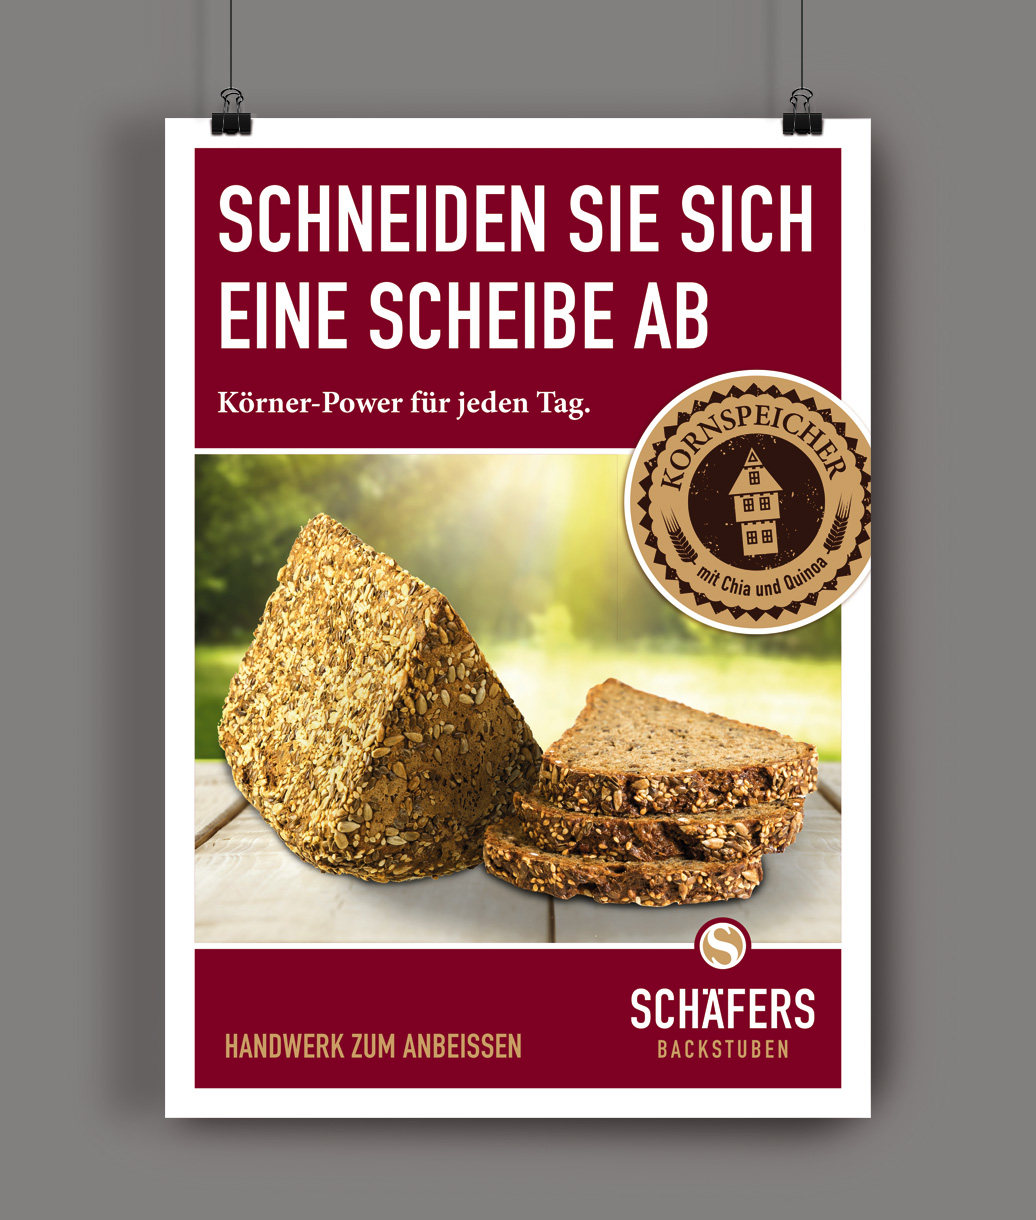 schaefers_ib_04